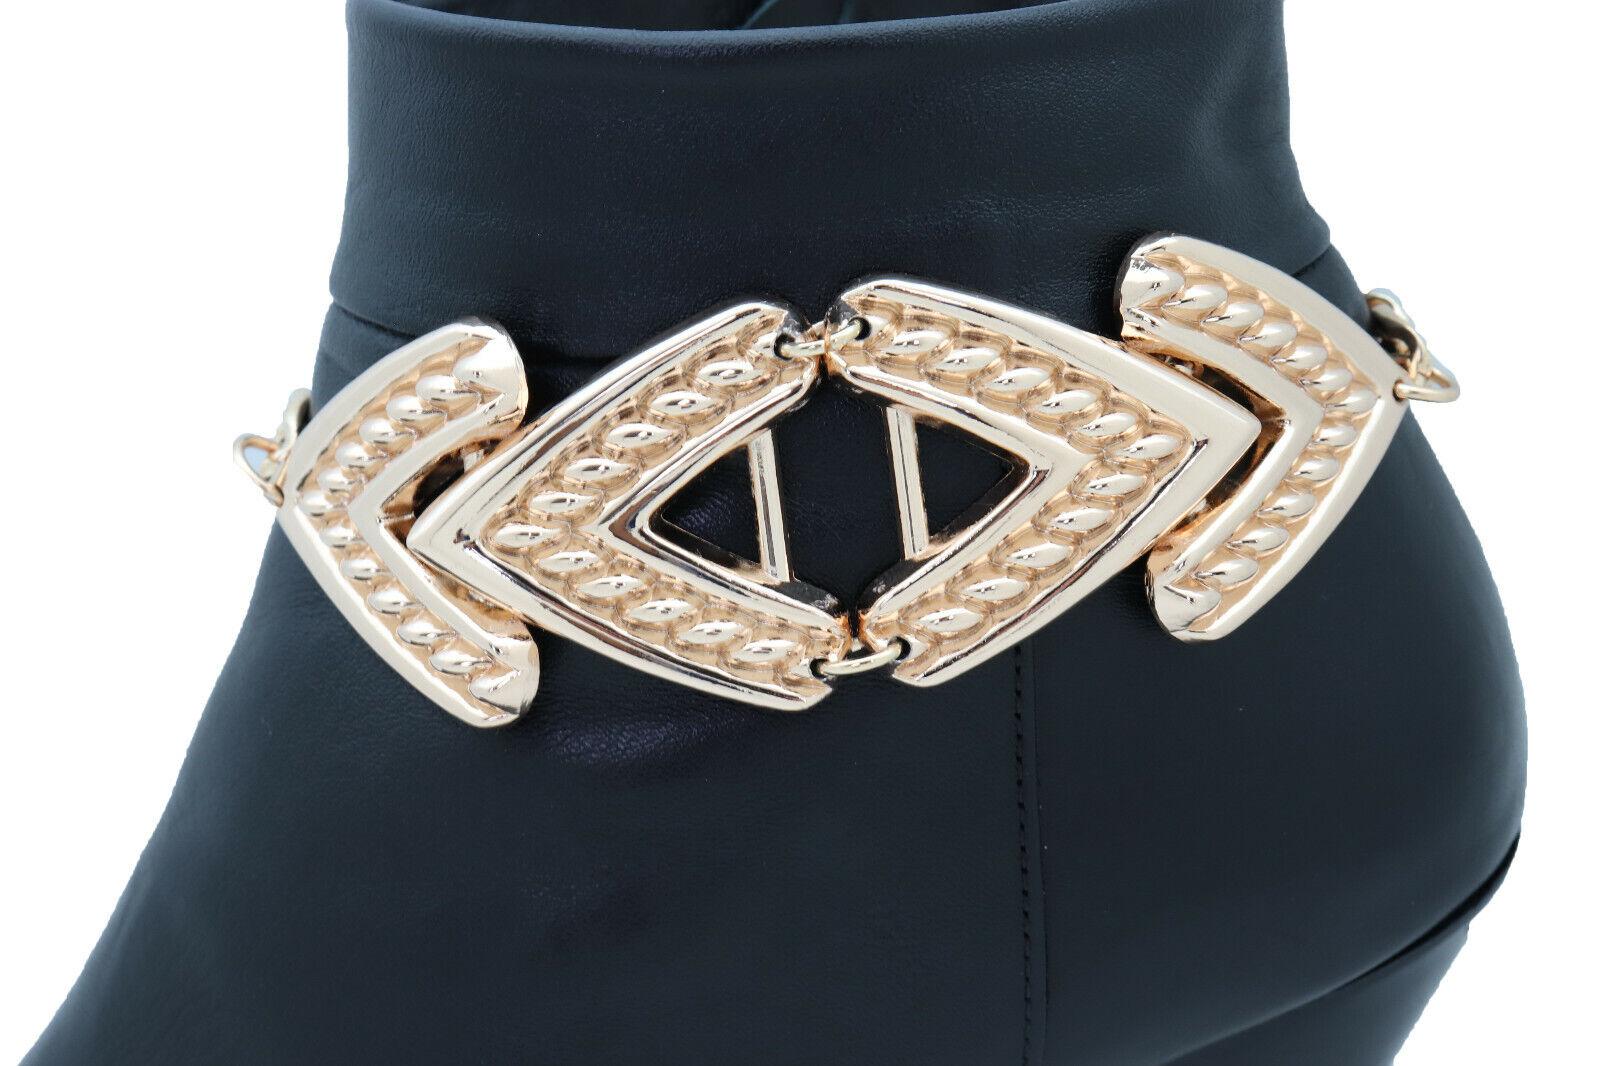 New Women Gold Metal Chain Accessory Bling Boot Bracelet Shoe Anklet Arrow Charm